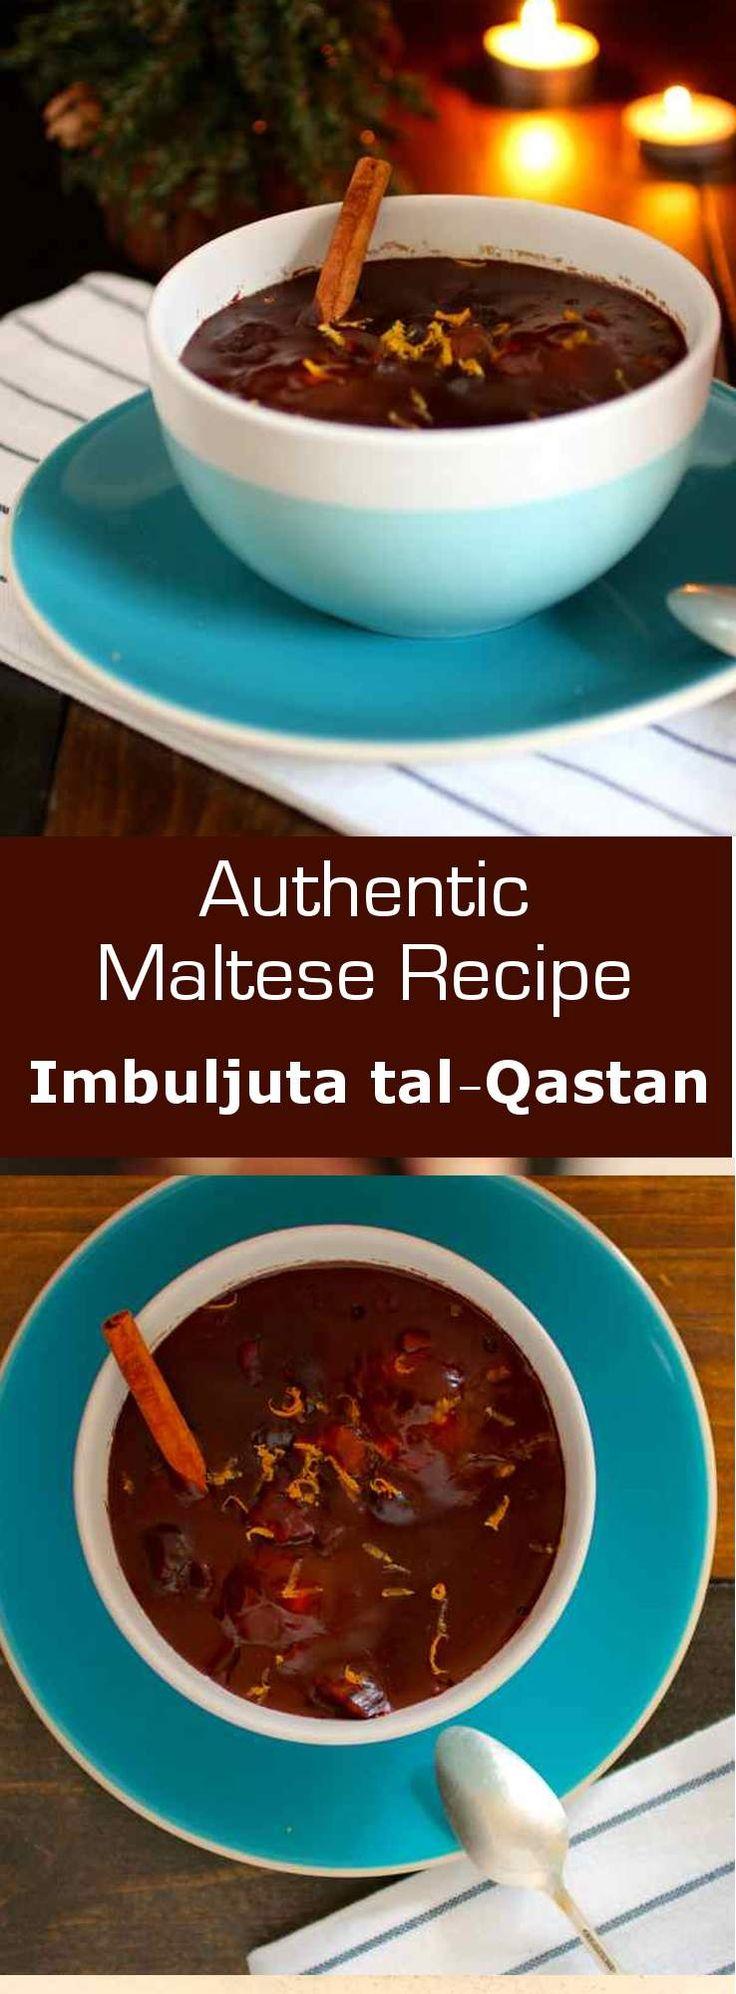 Imbuljuta tal-Qastan is a traditional hot and spiced cocoa-based Maltese drink…